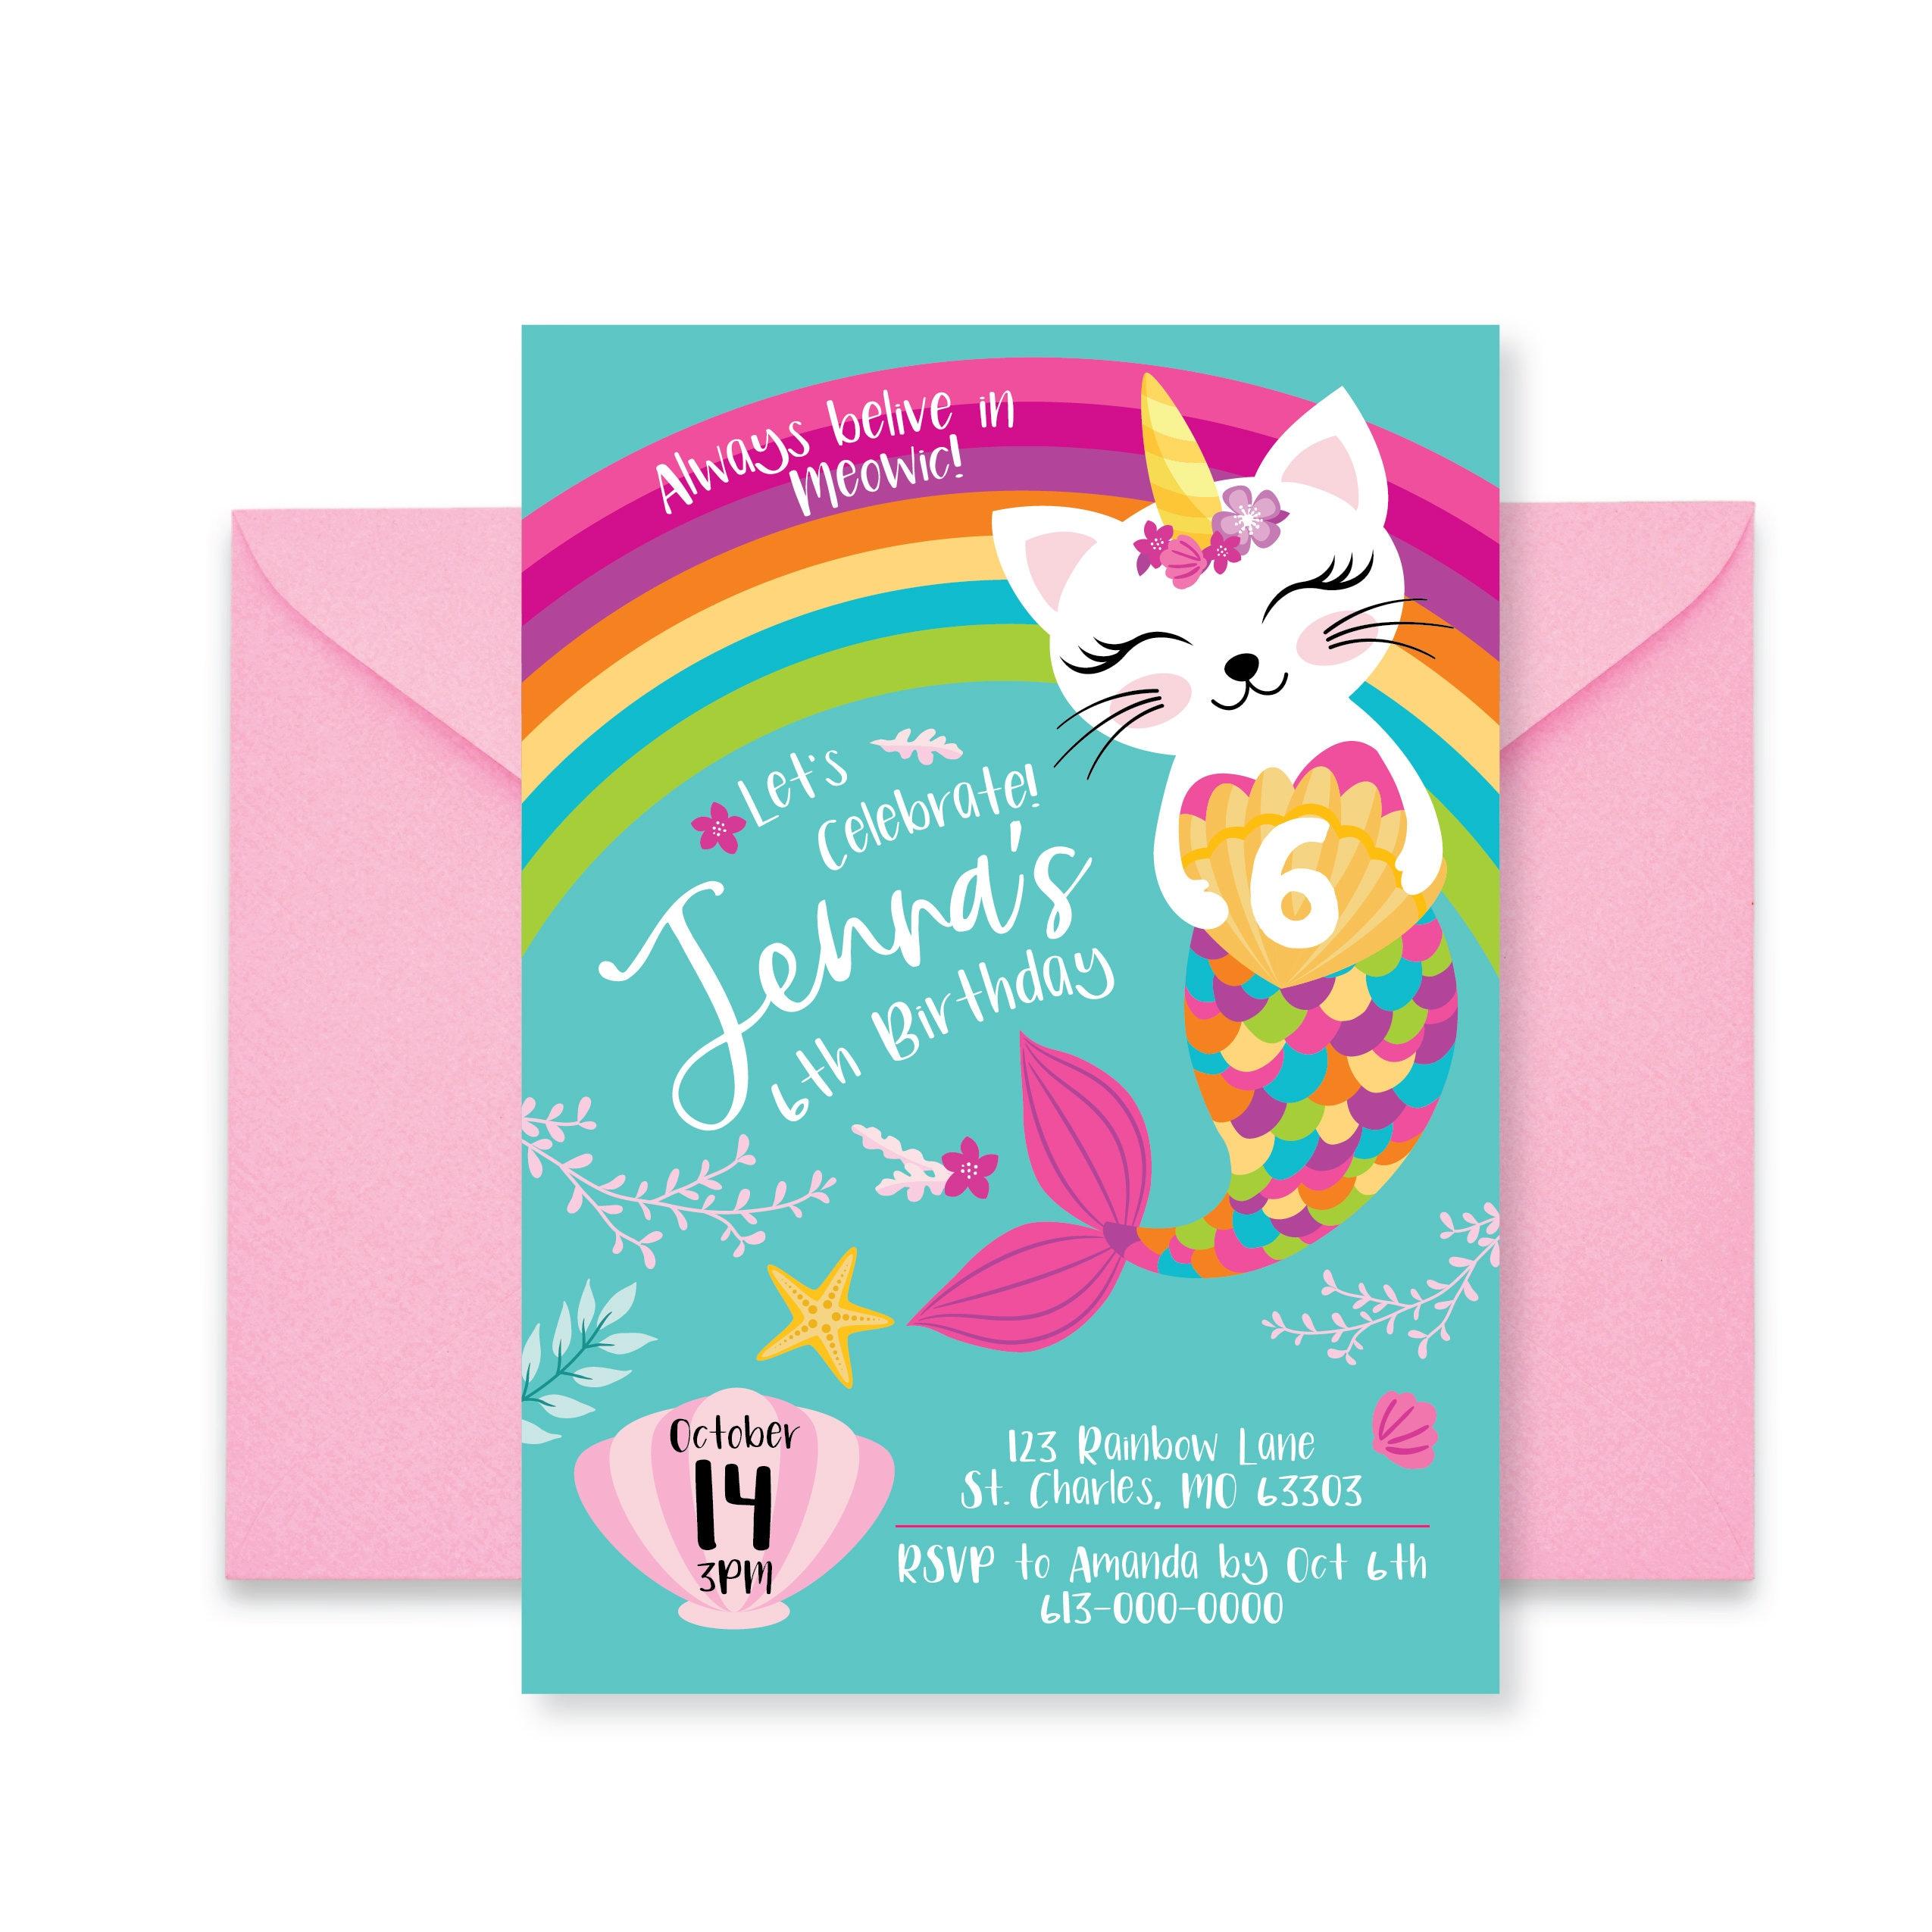 Unicorn And Cat Birthday Card For Granddaughter: Caticorn, Rainbow Birthday Party Invitation, Cat, Mermaid